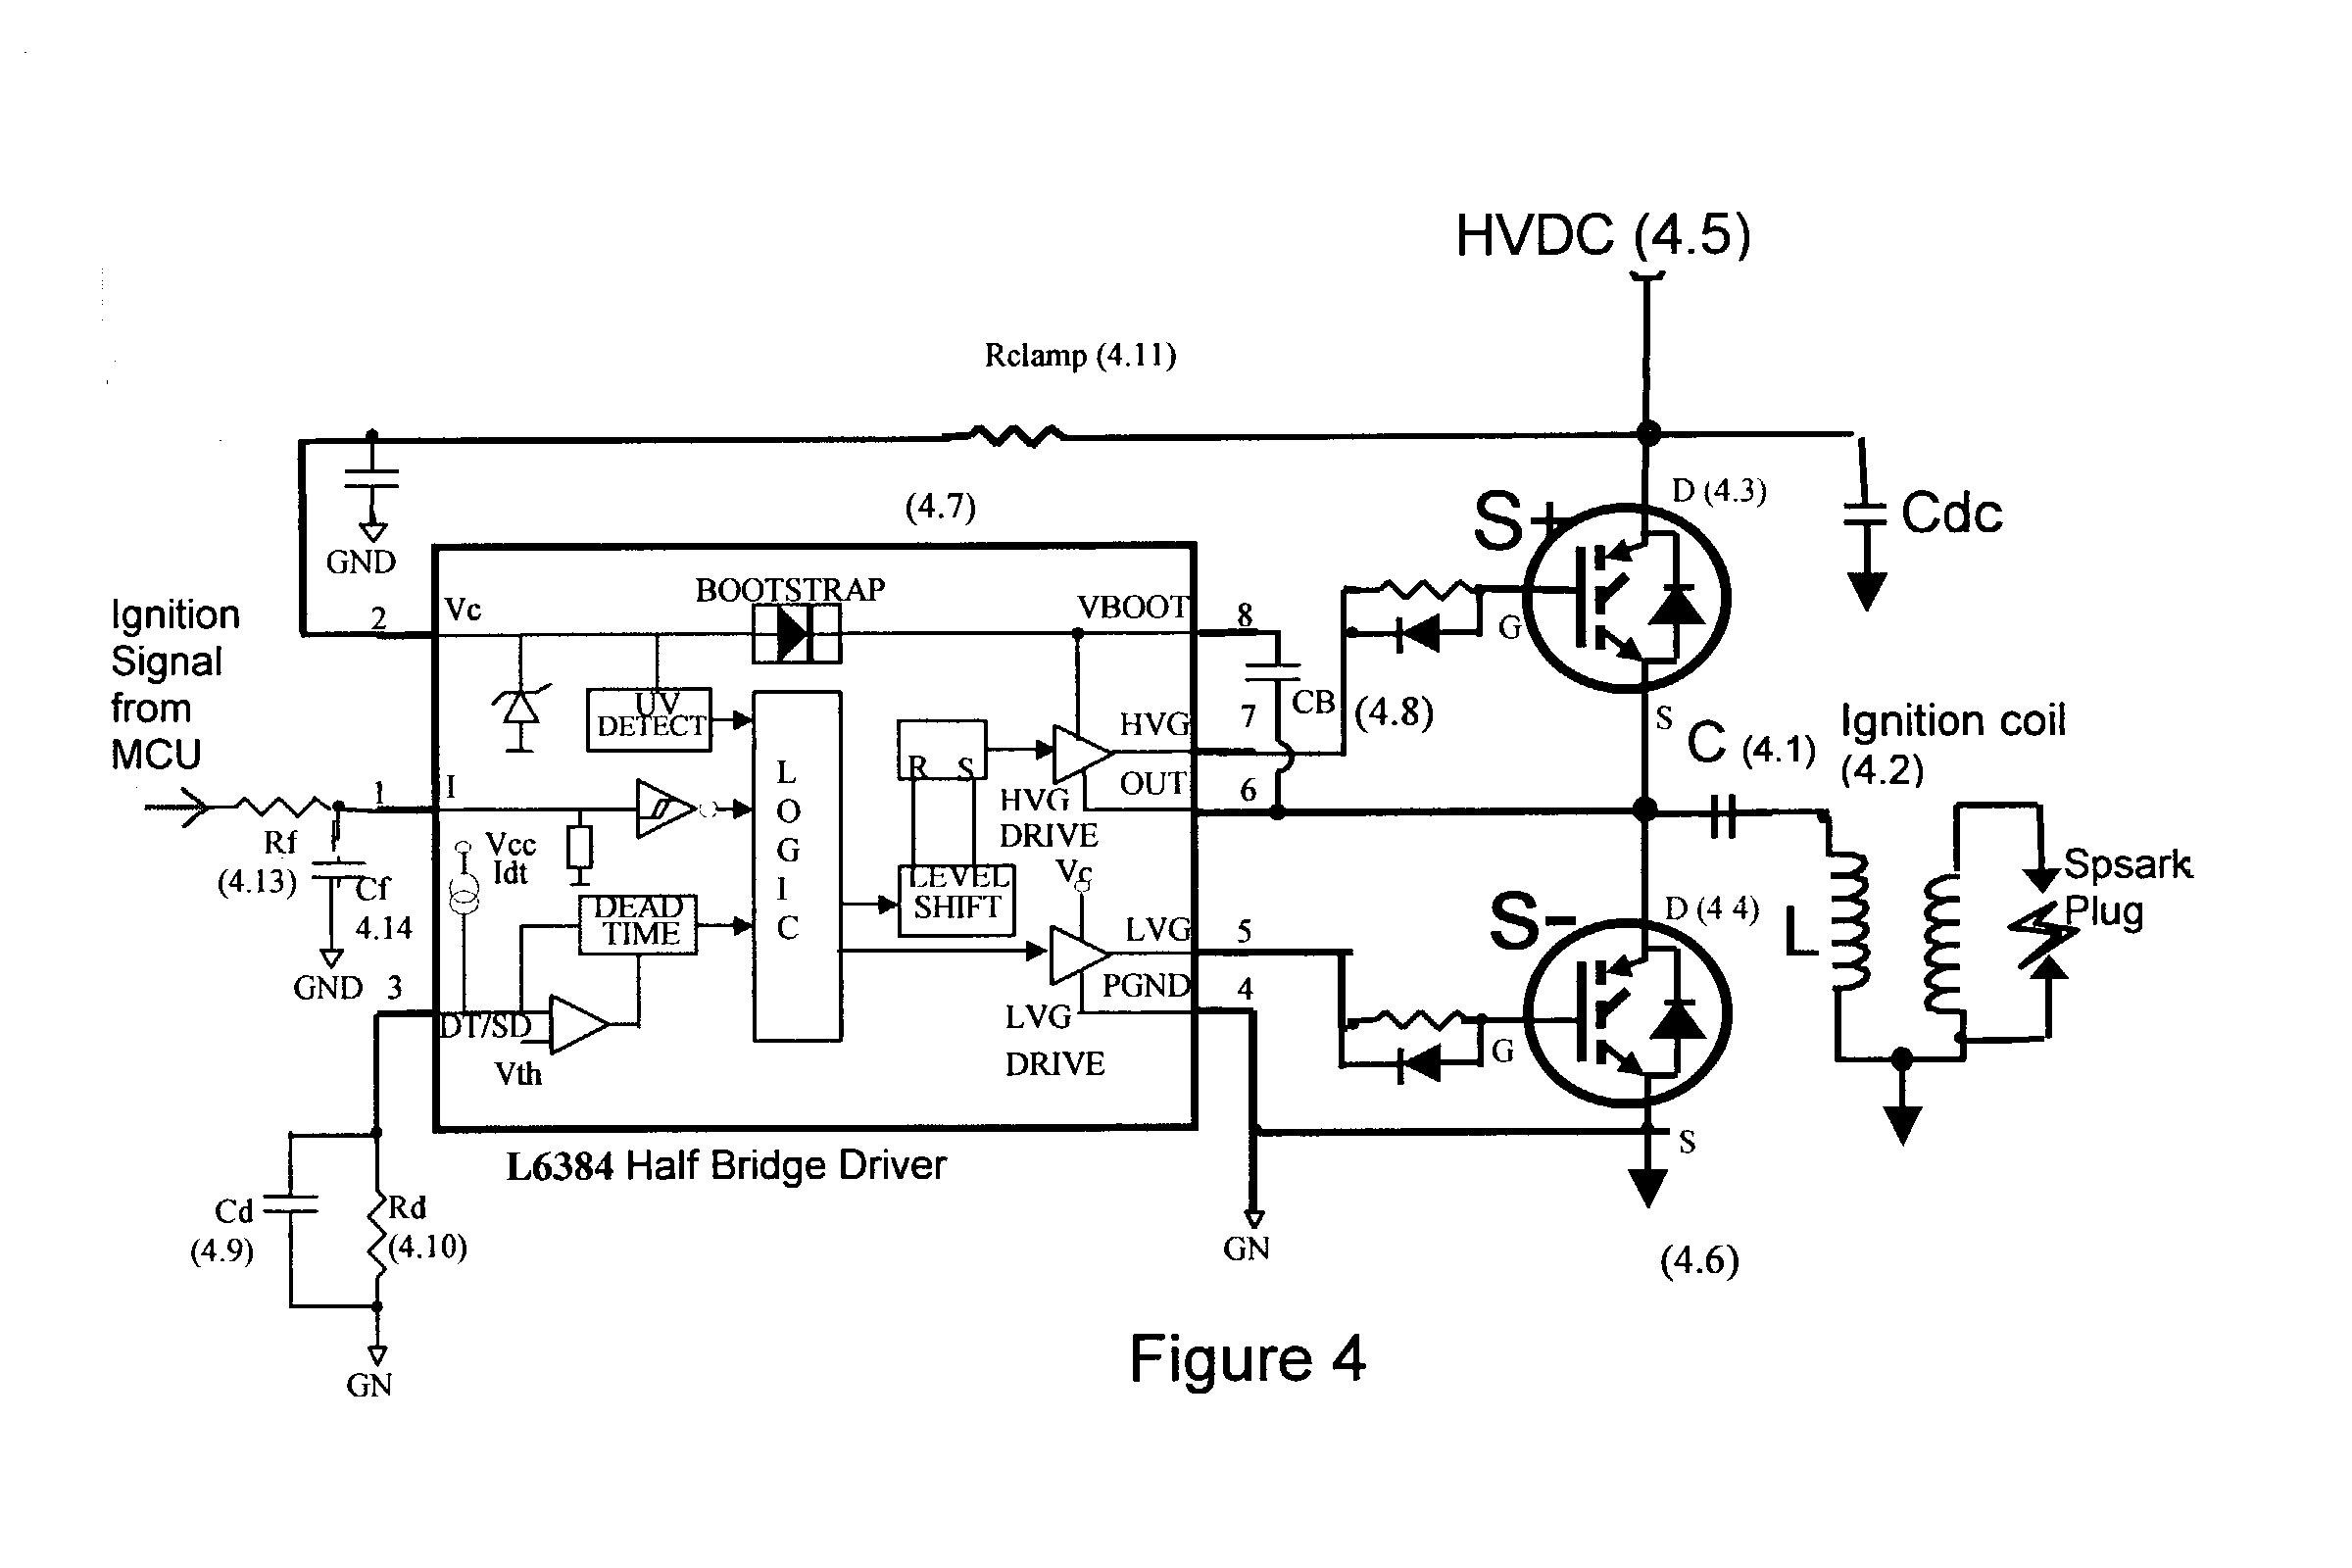 Ignition Coil Circuit Diagram